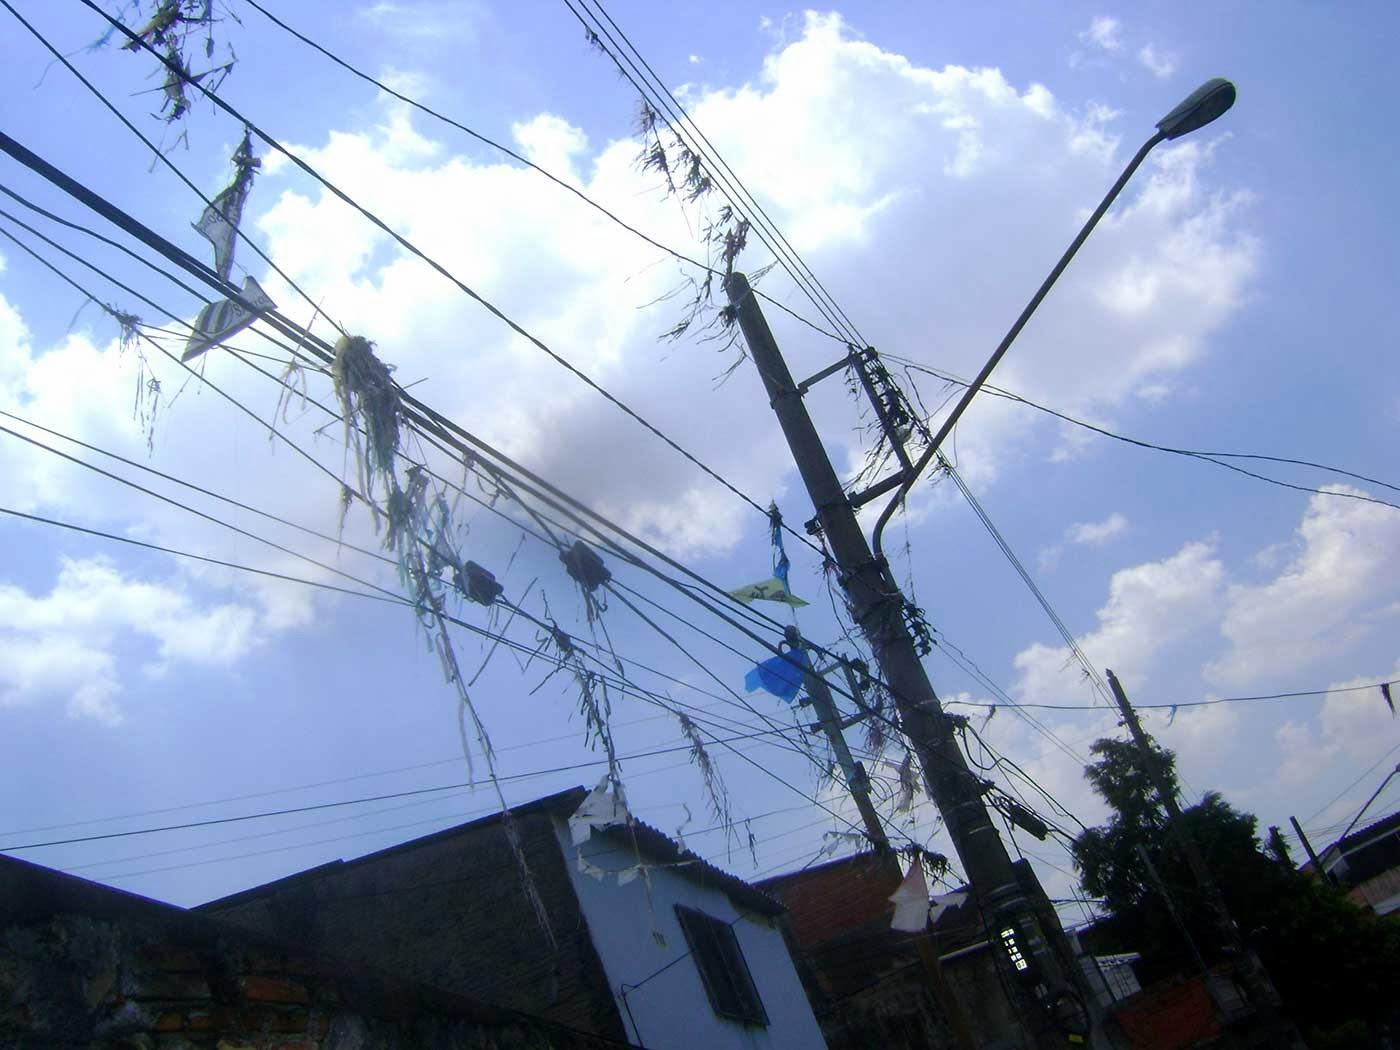 Vila Santa Isabel, Zona Leste de São Paulo, pipas e rabiolas, fios elétricos, Vila Formosa, Vila Carrão